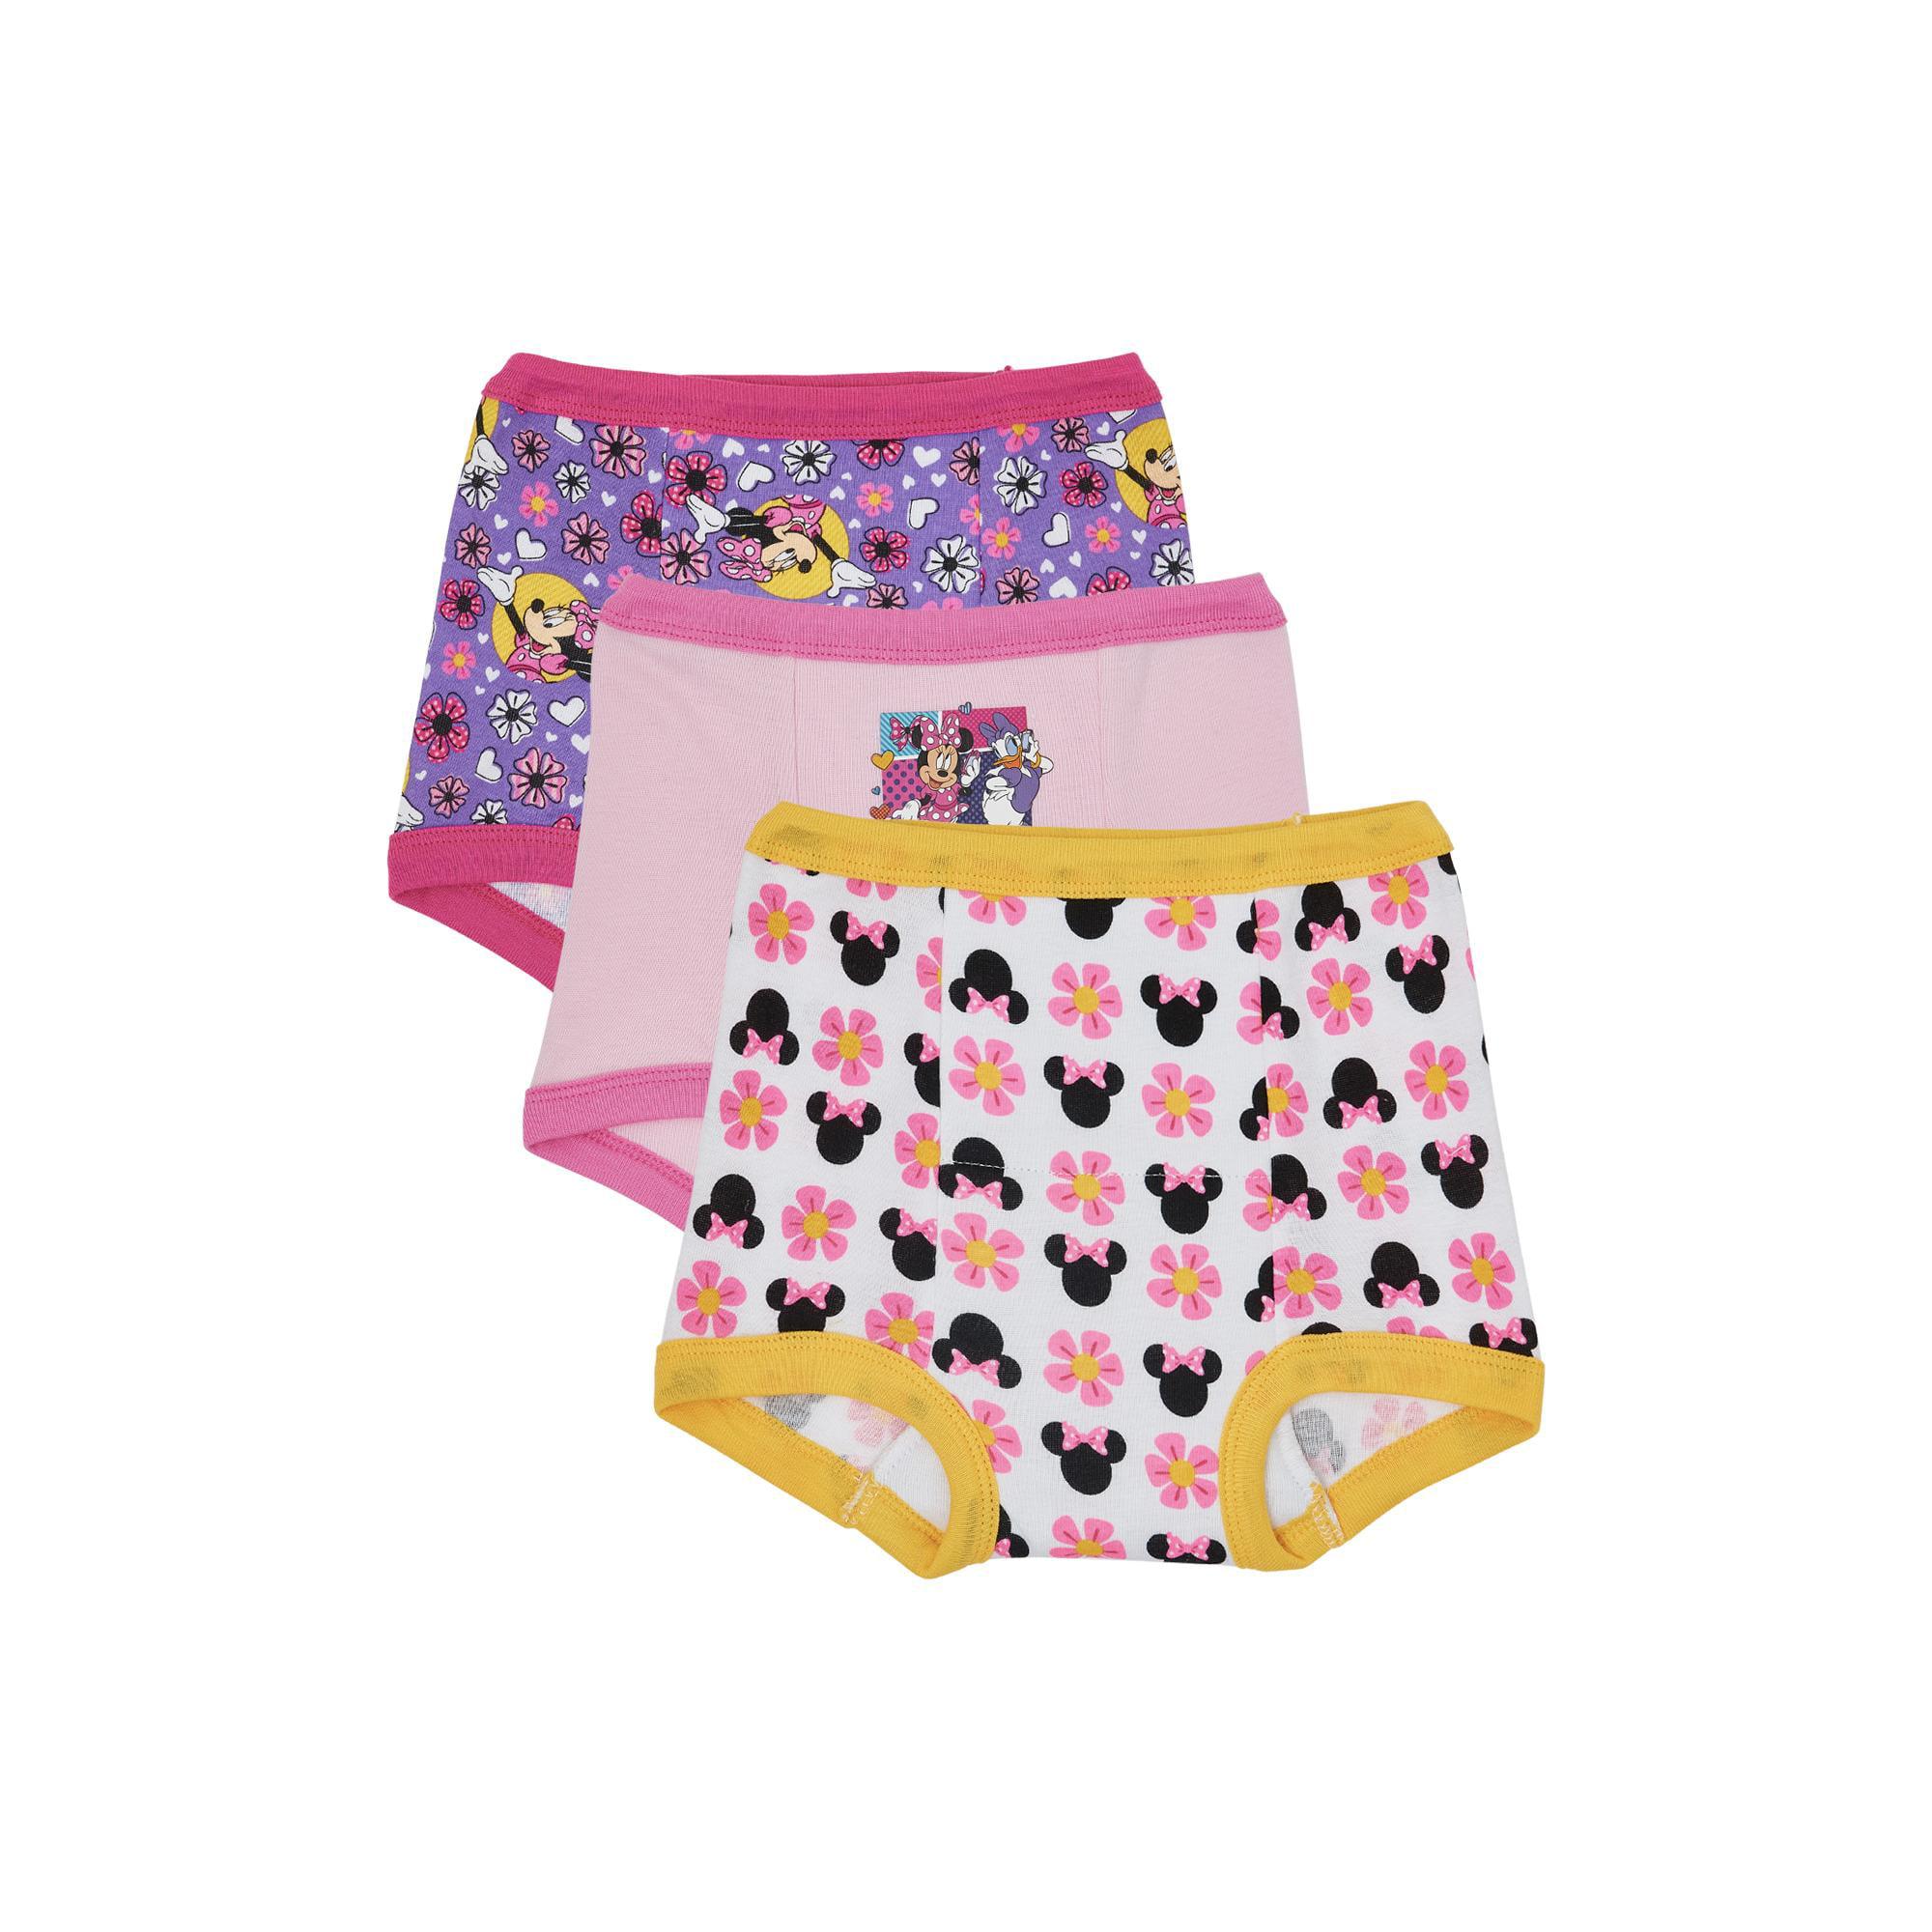 Pink//Cream 3T GERBER Training Pants Toddler Girl